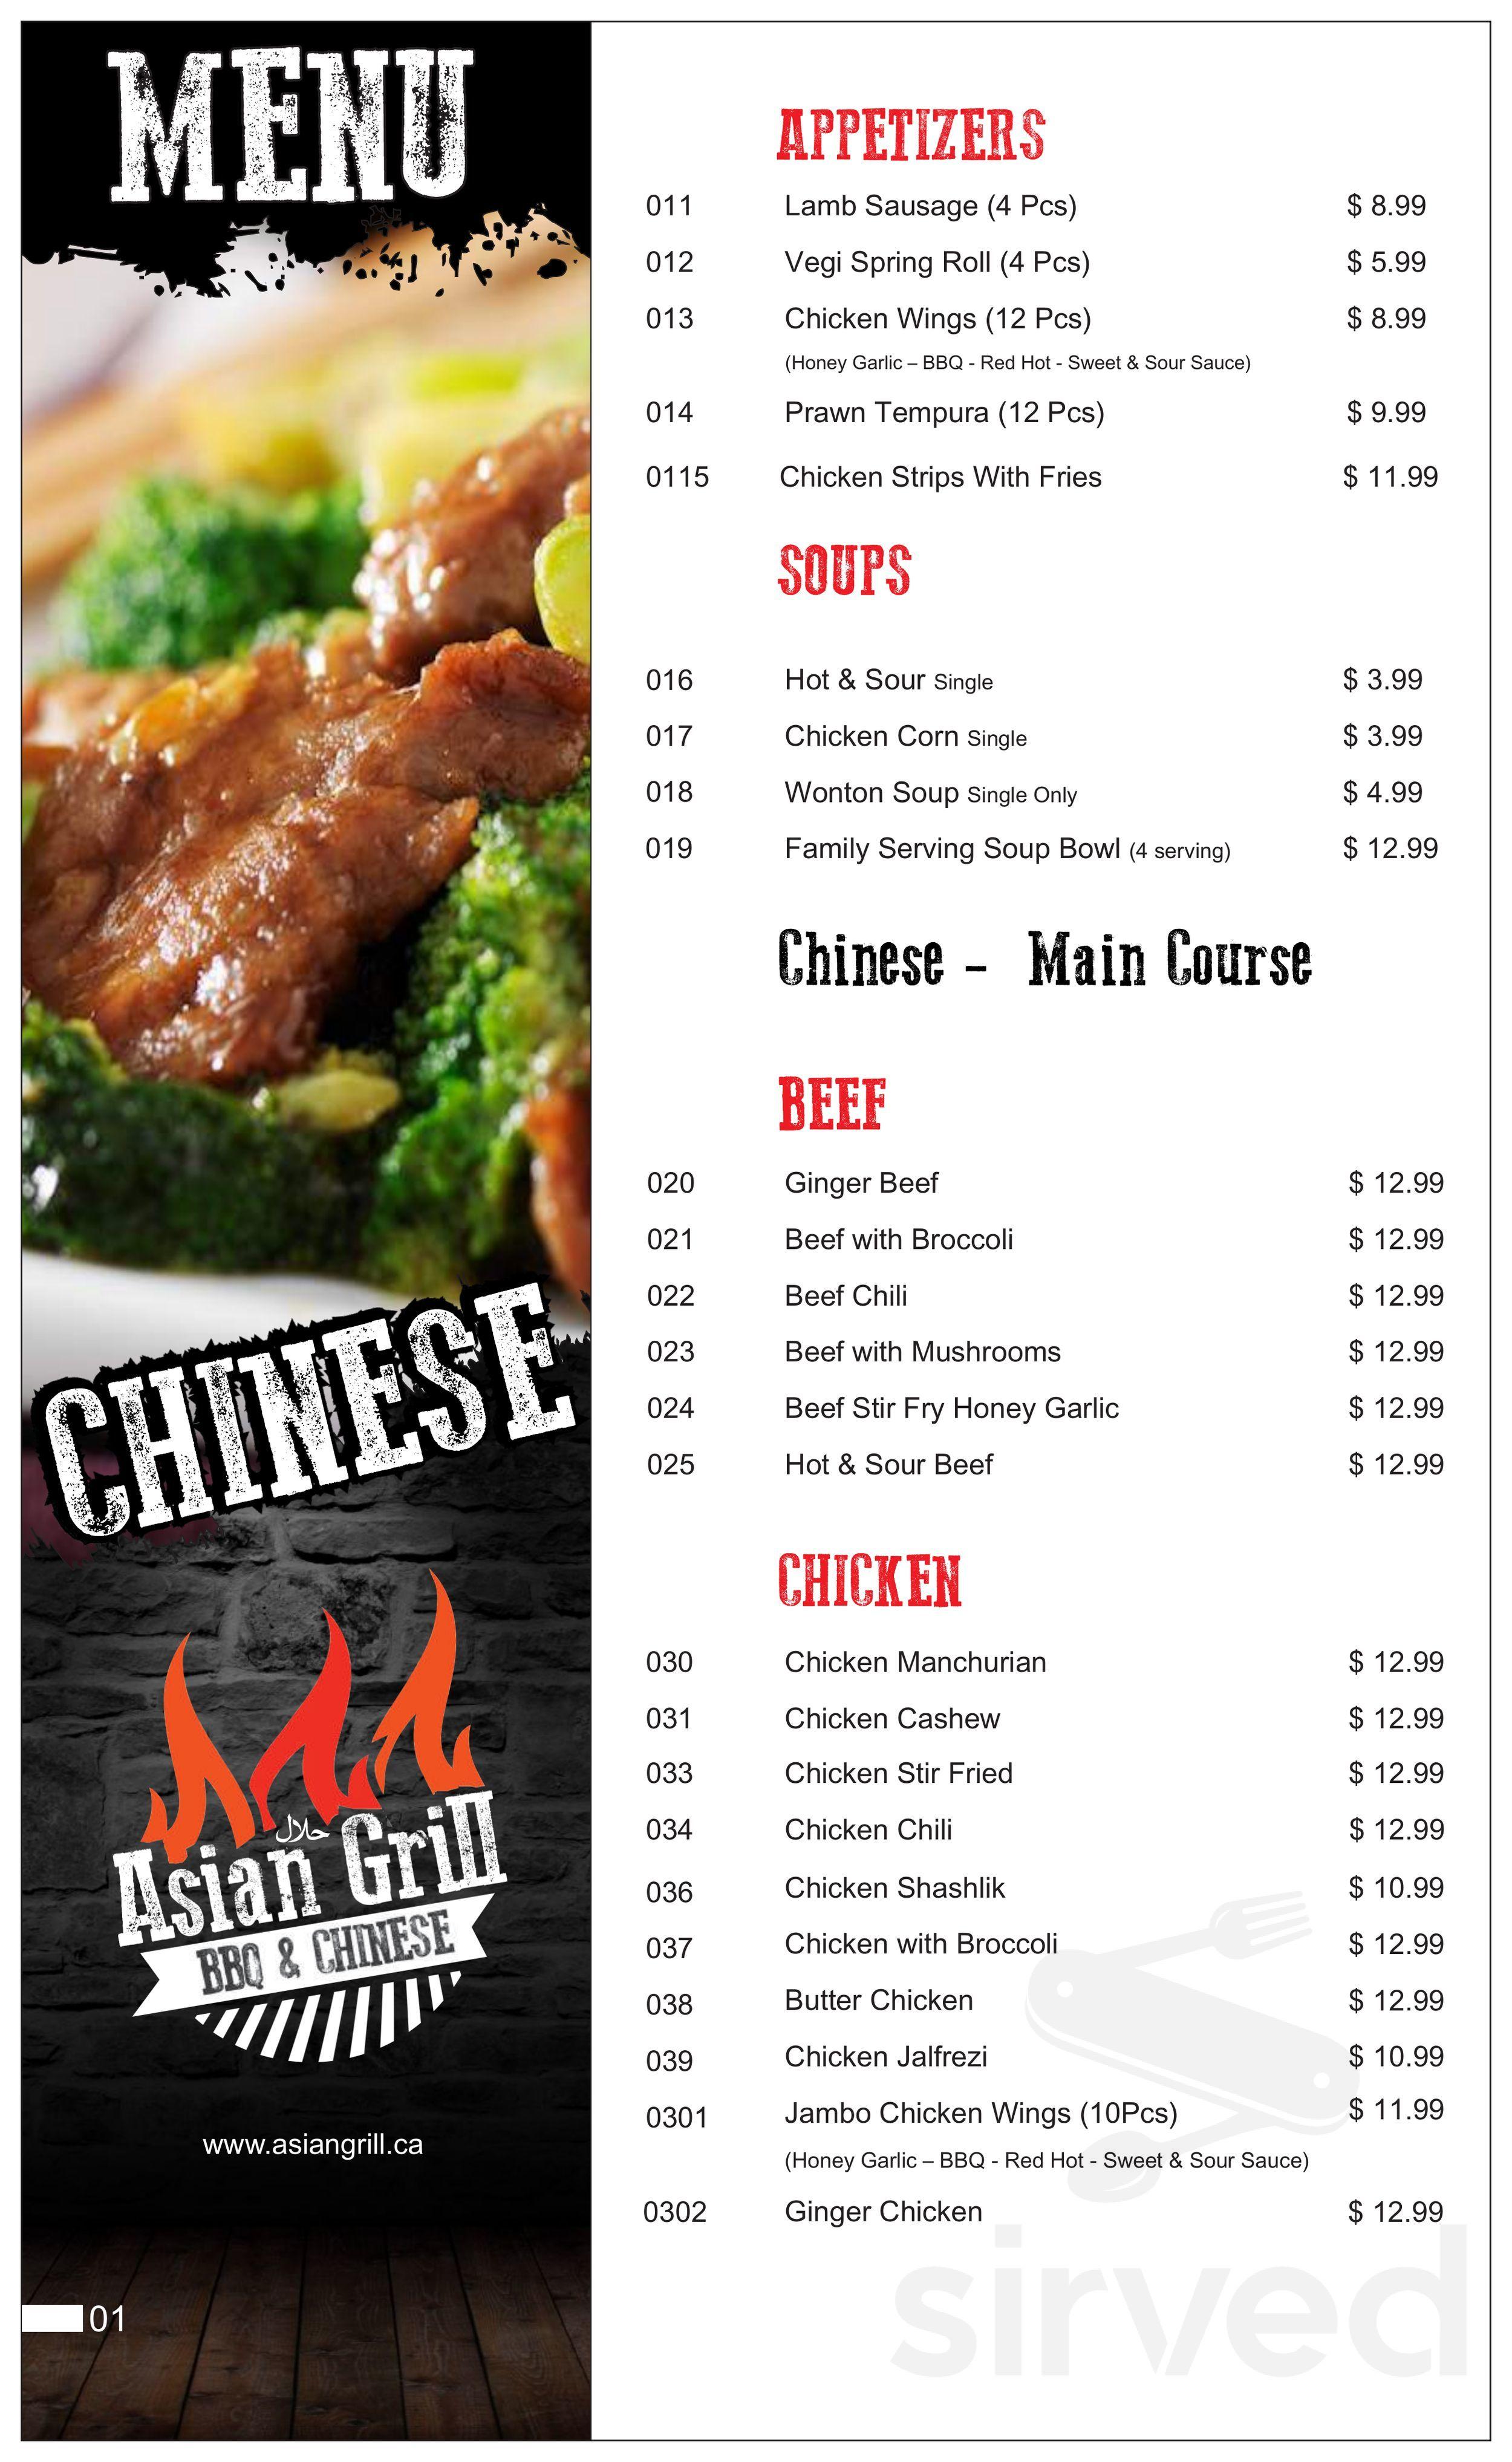 Asian Grill Bbq Chinese Halal Menu In Calgary Alberta